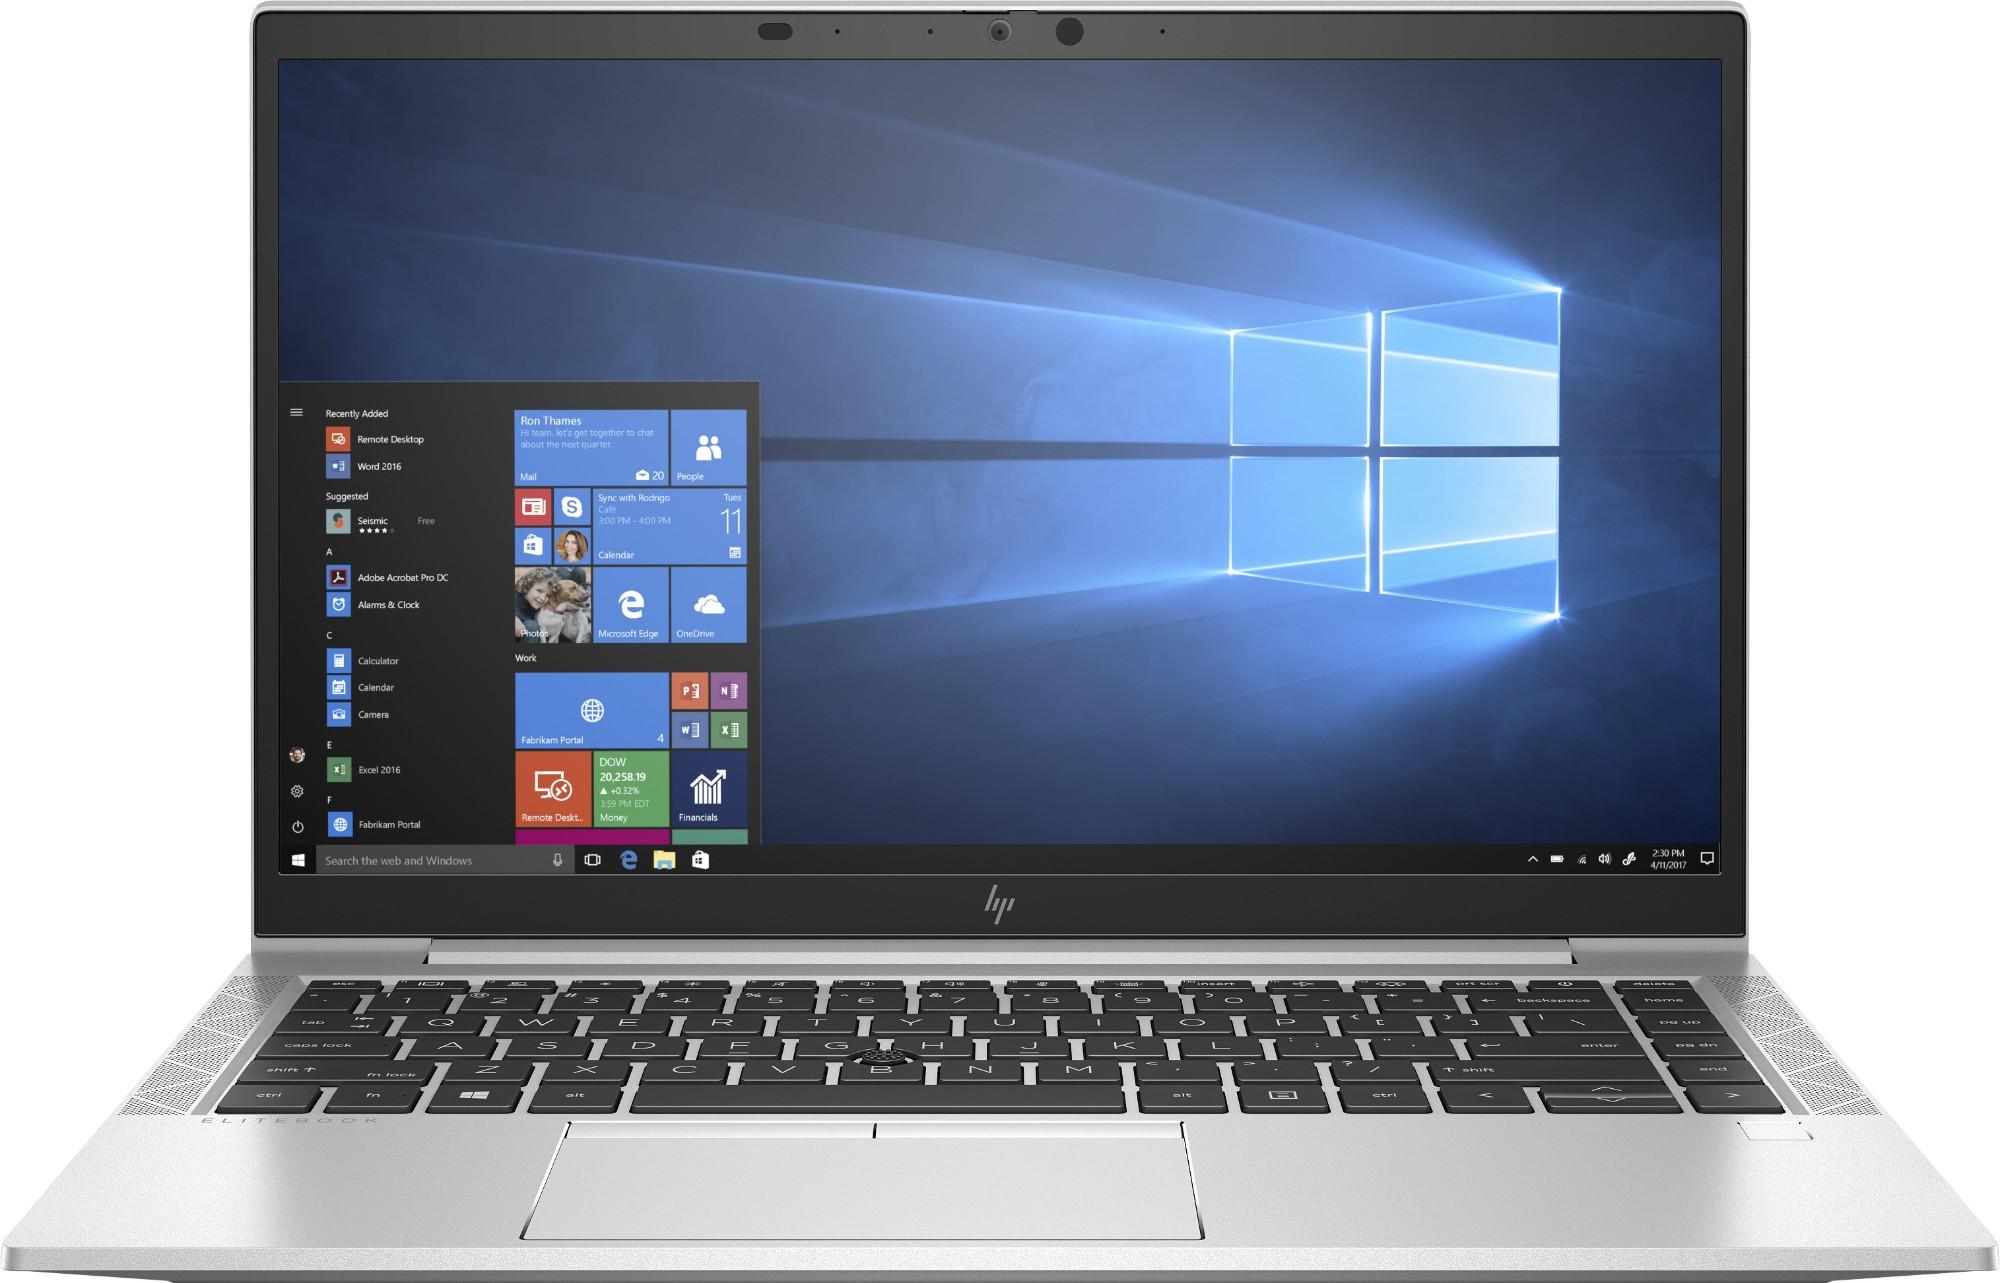 "HP EliteBook 840 G7 Ultra-draagbaar Zilver 35,6 cm (14"") 1920 x 1080 Pixels Intel® 10de generatie Core™ i5 8 GB DDR4-SDRAM 256 GB SSD Wi-Fi 6 (802.11ax) Windows 10 Pro"